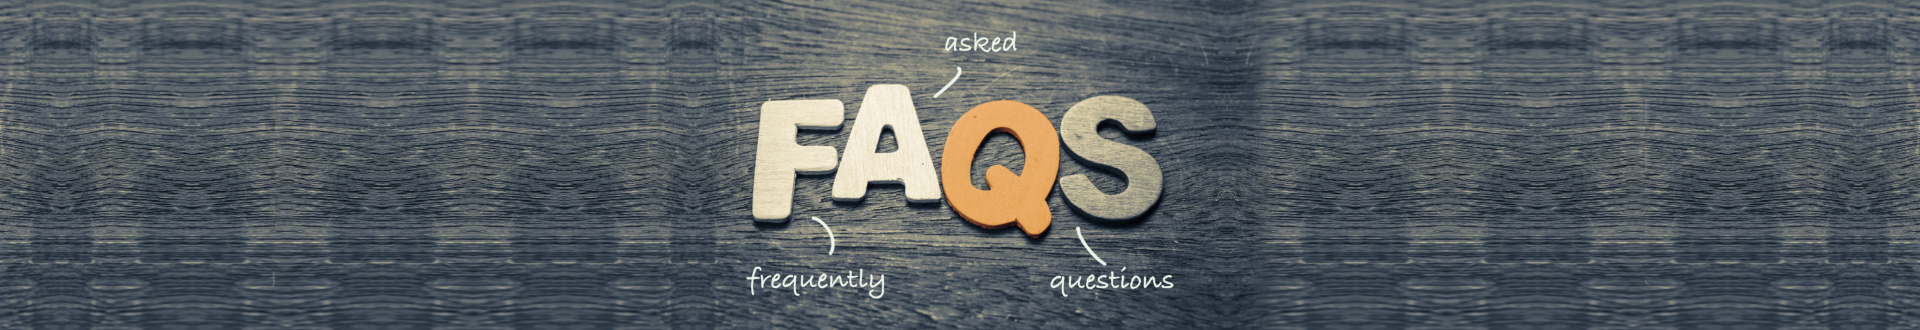 FAQS concept